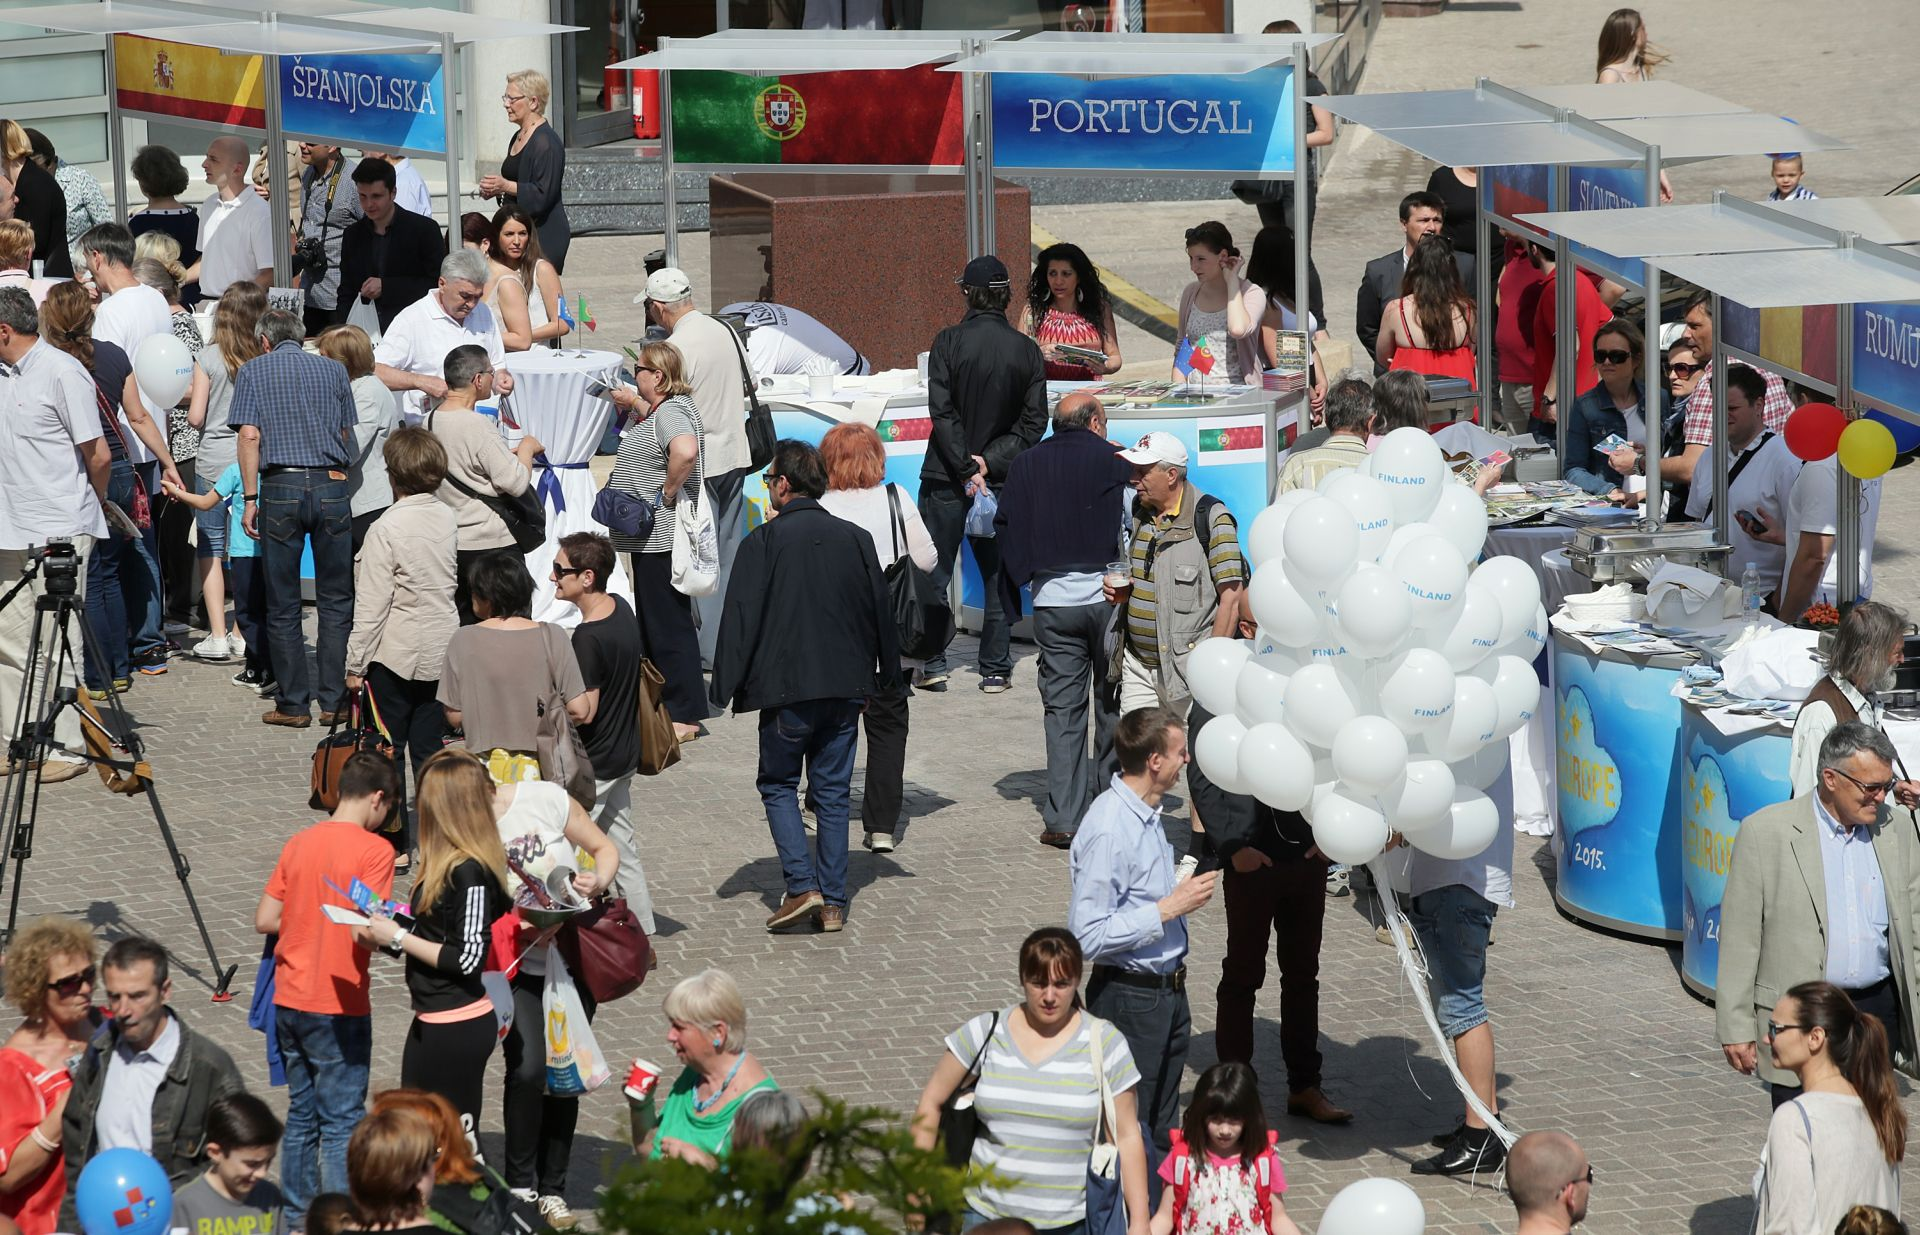 Počeo Europski tjedan središnjom proslavom na Trgu Europe